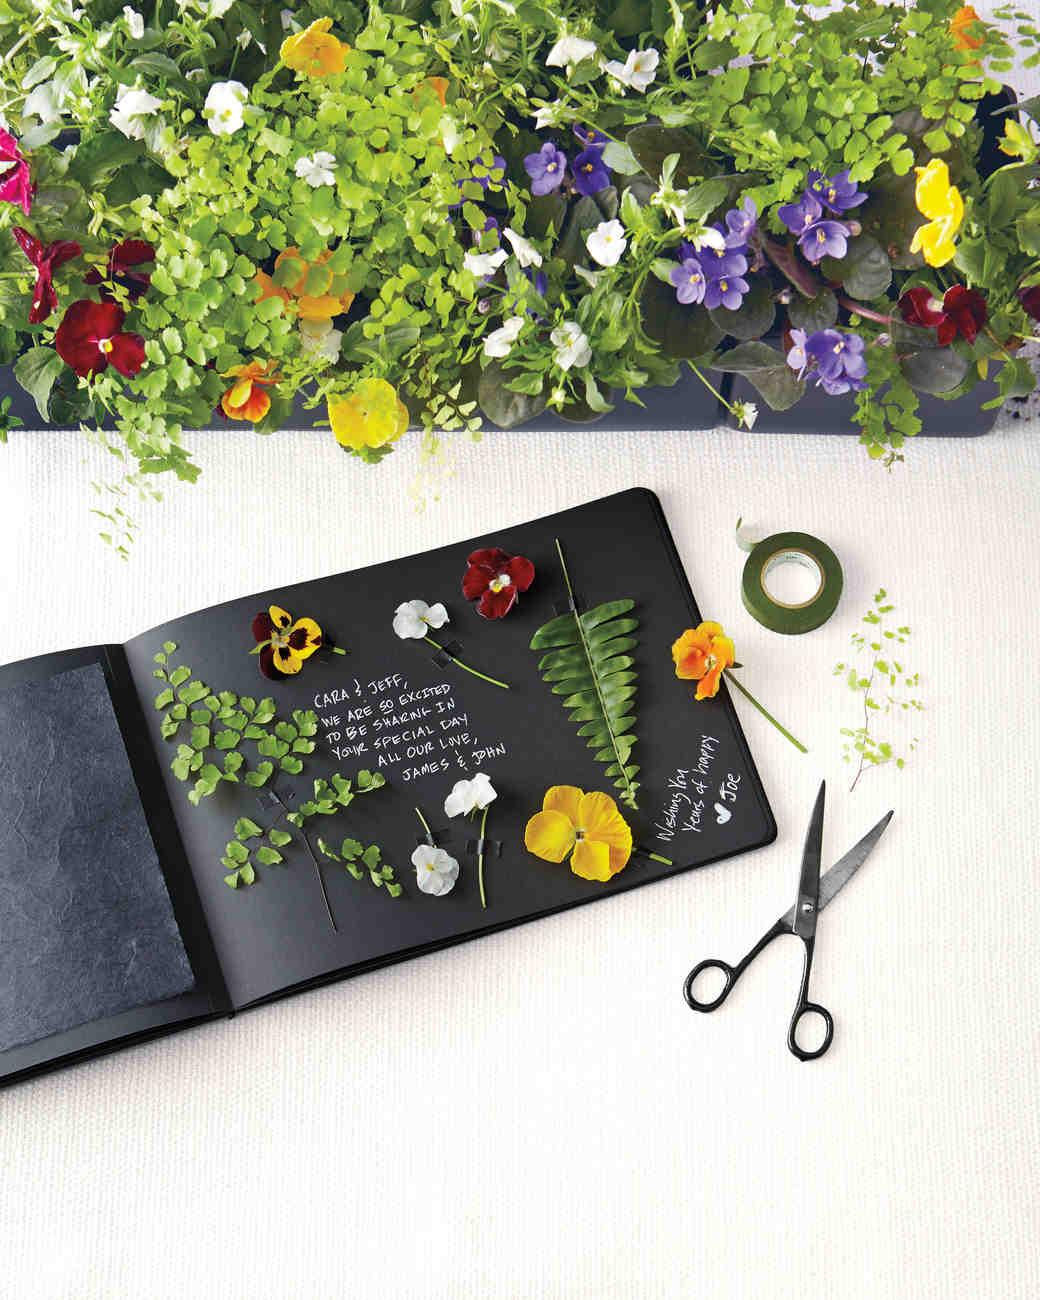 17 Super Creative DIY Guest Book Ideas for Your Wedding Martha